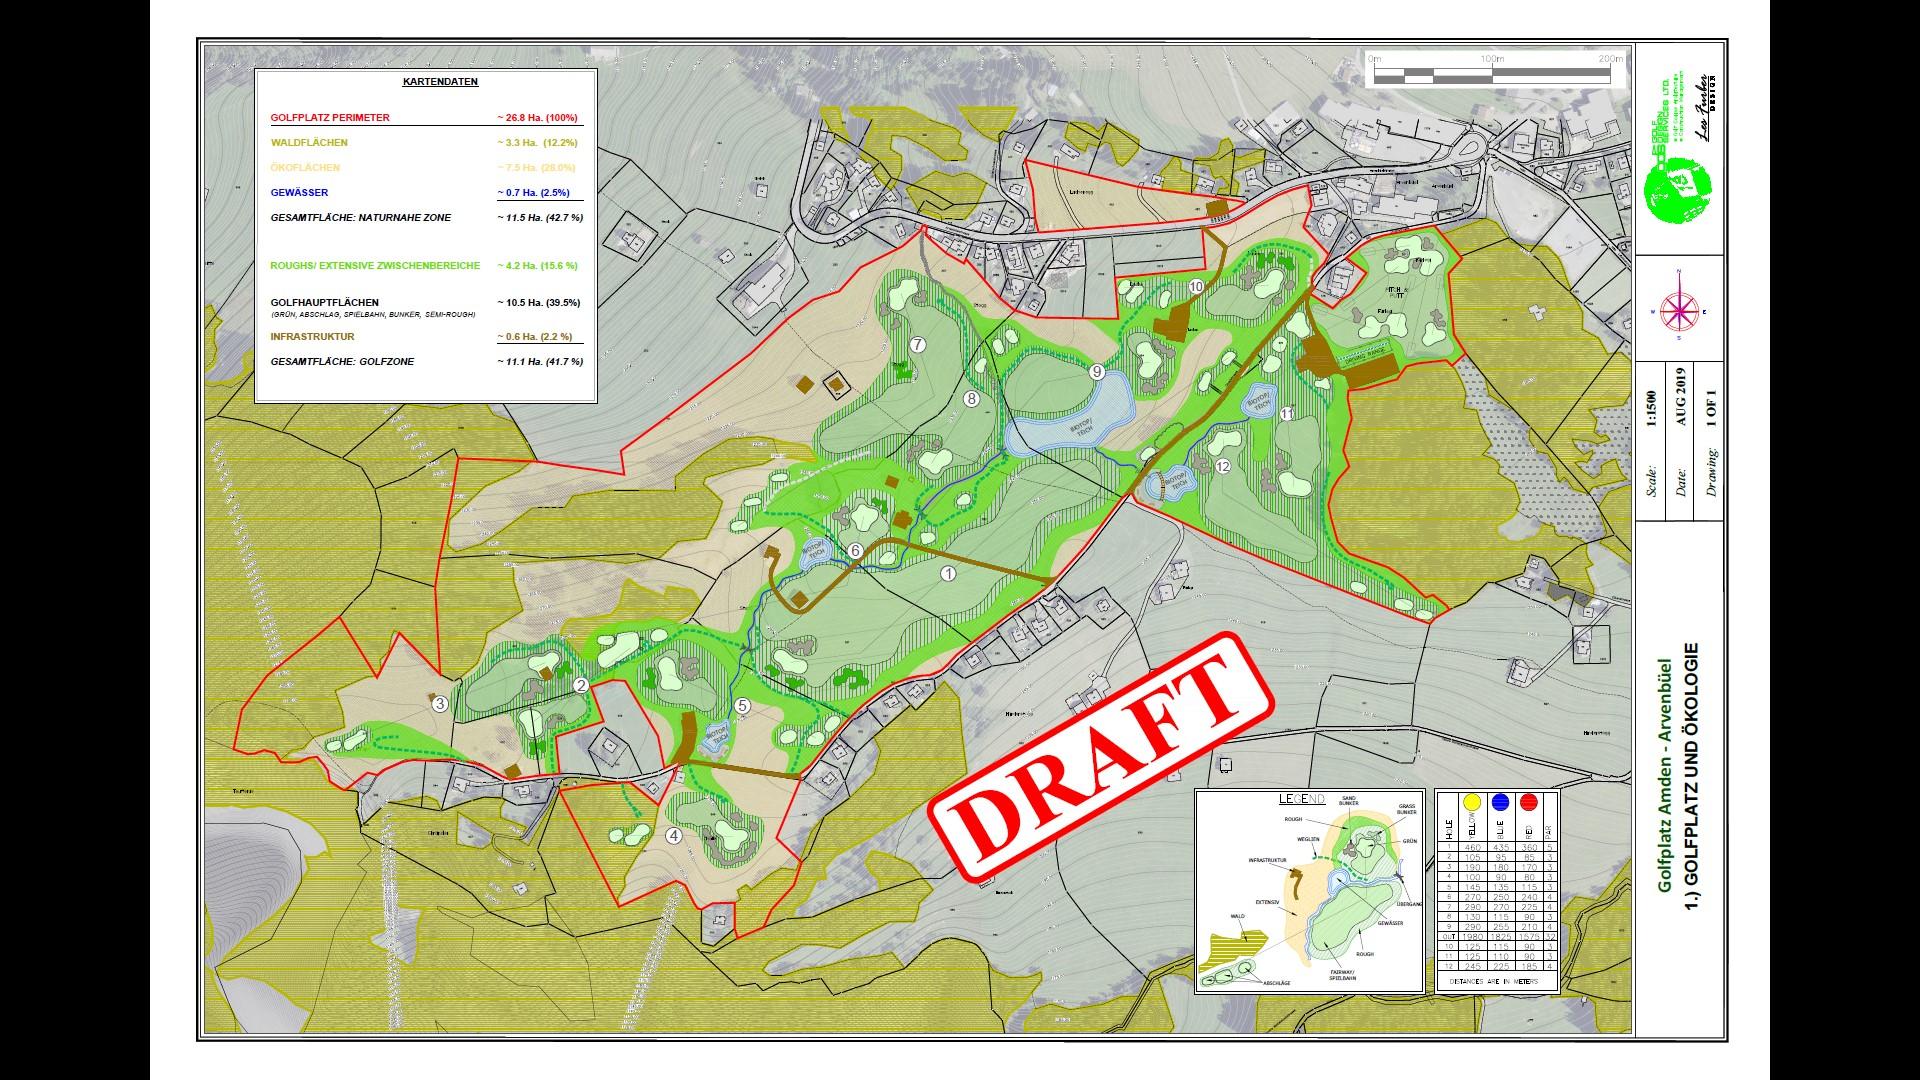 Golfplan Entwurf